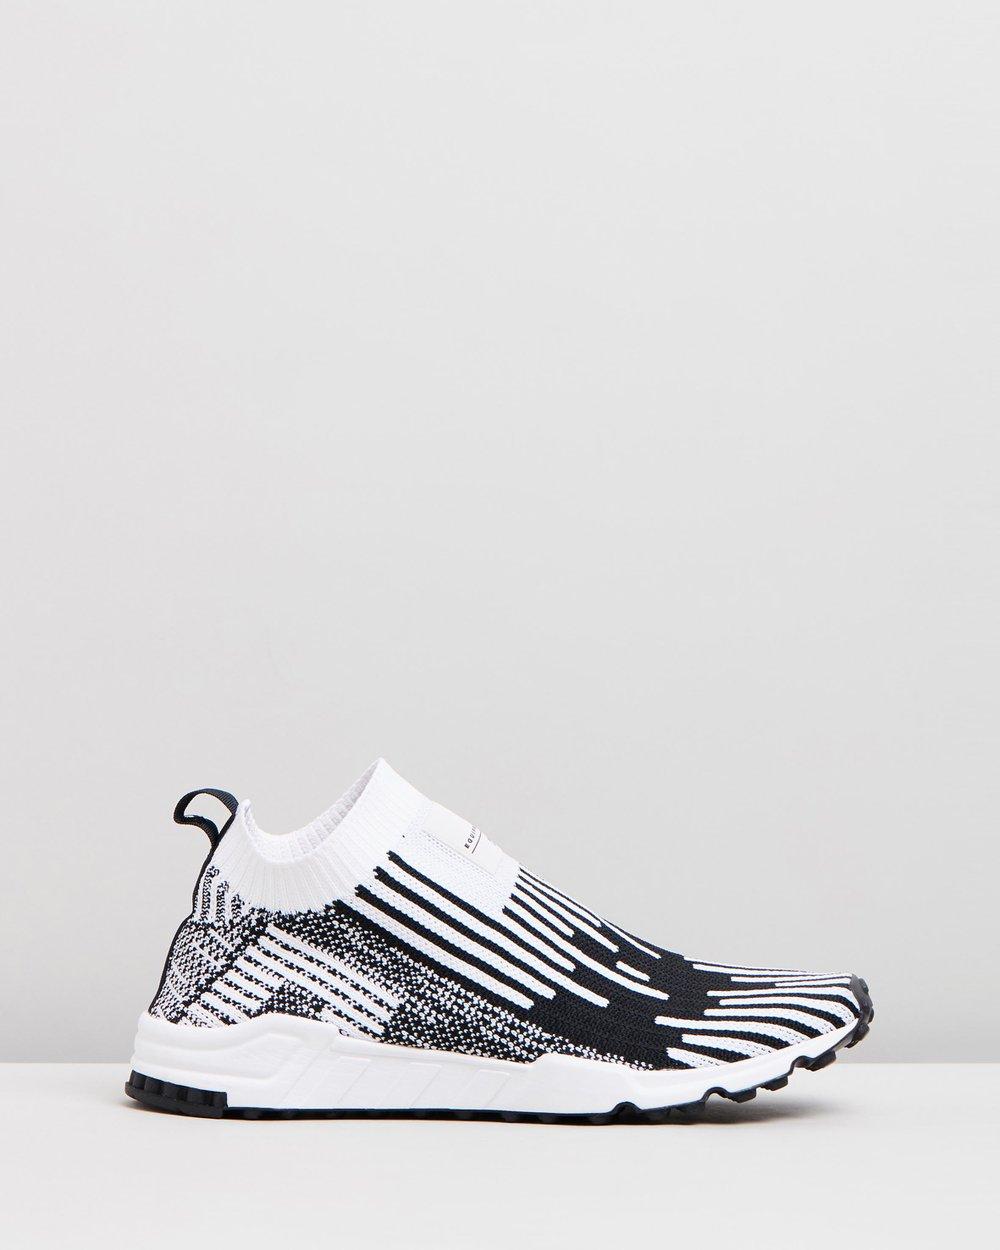 brand new 6a7b8 06ec1 EQT Support Sock Primeknit - Unisex by adidas Originals Online  THE ICONIC   Australia